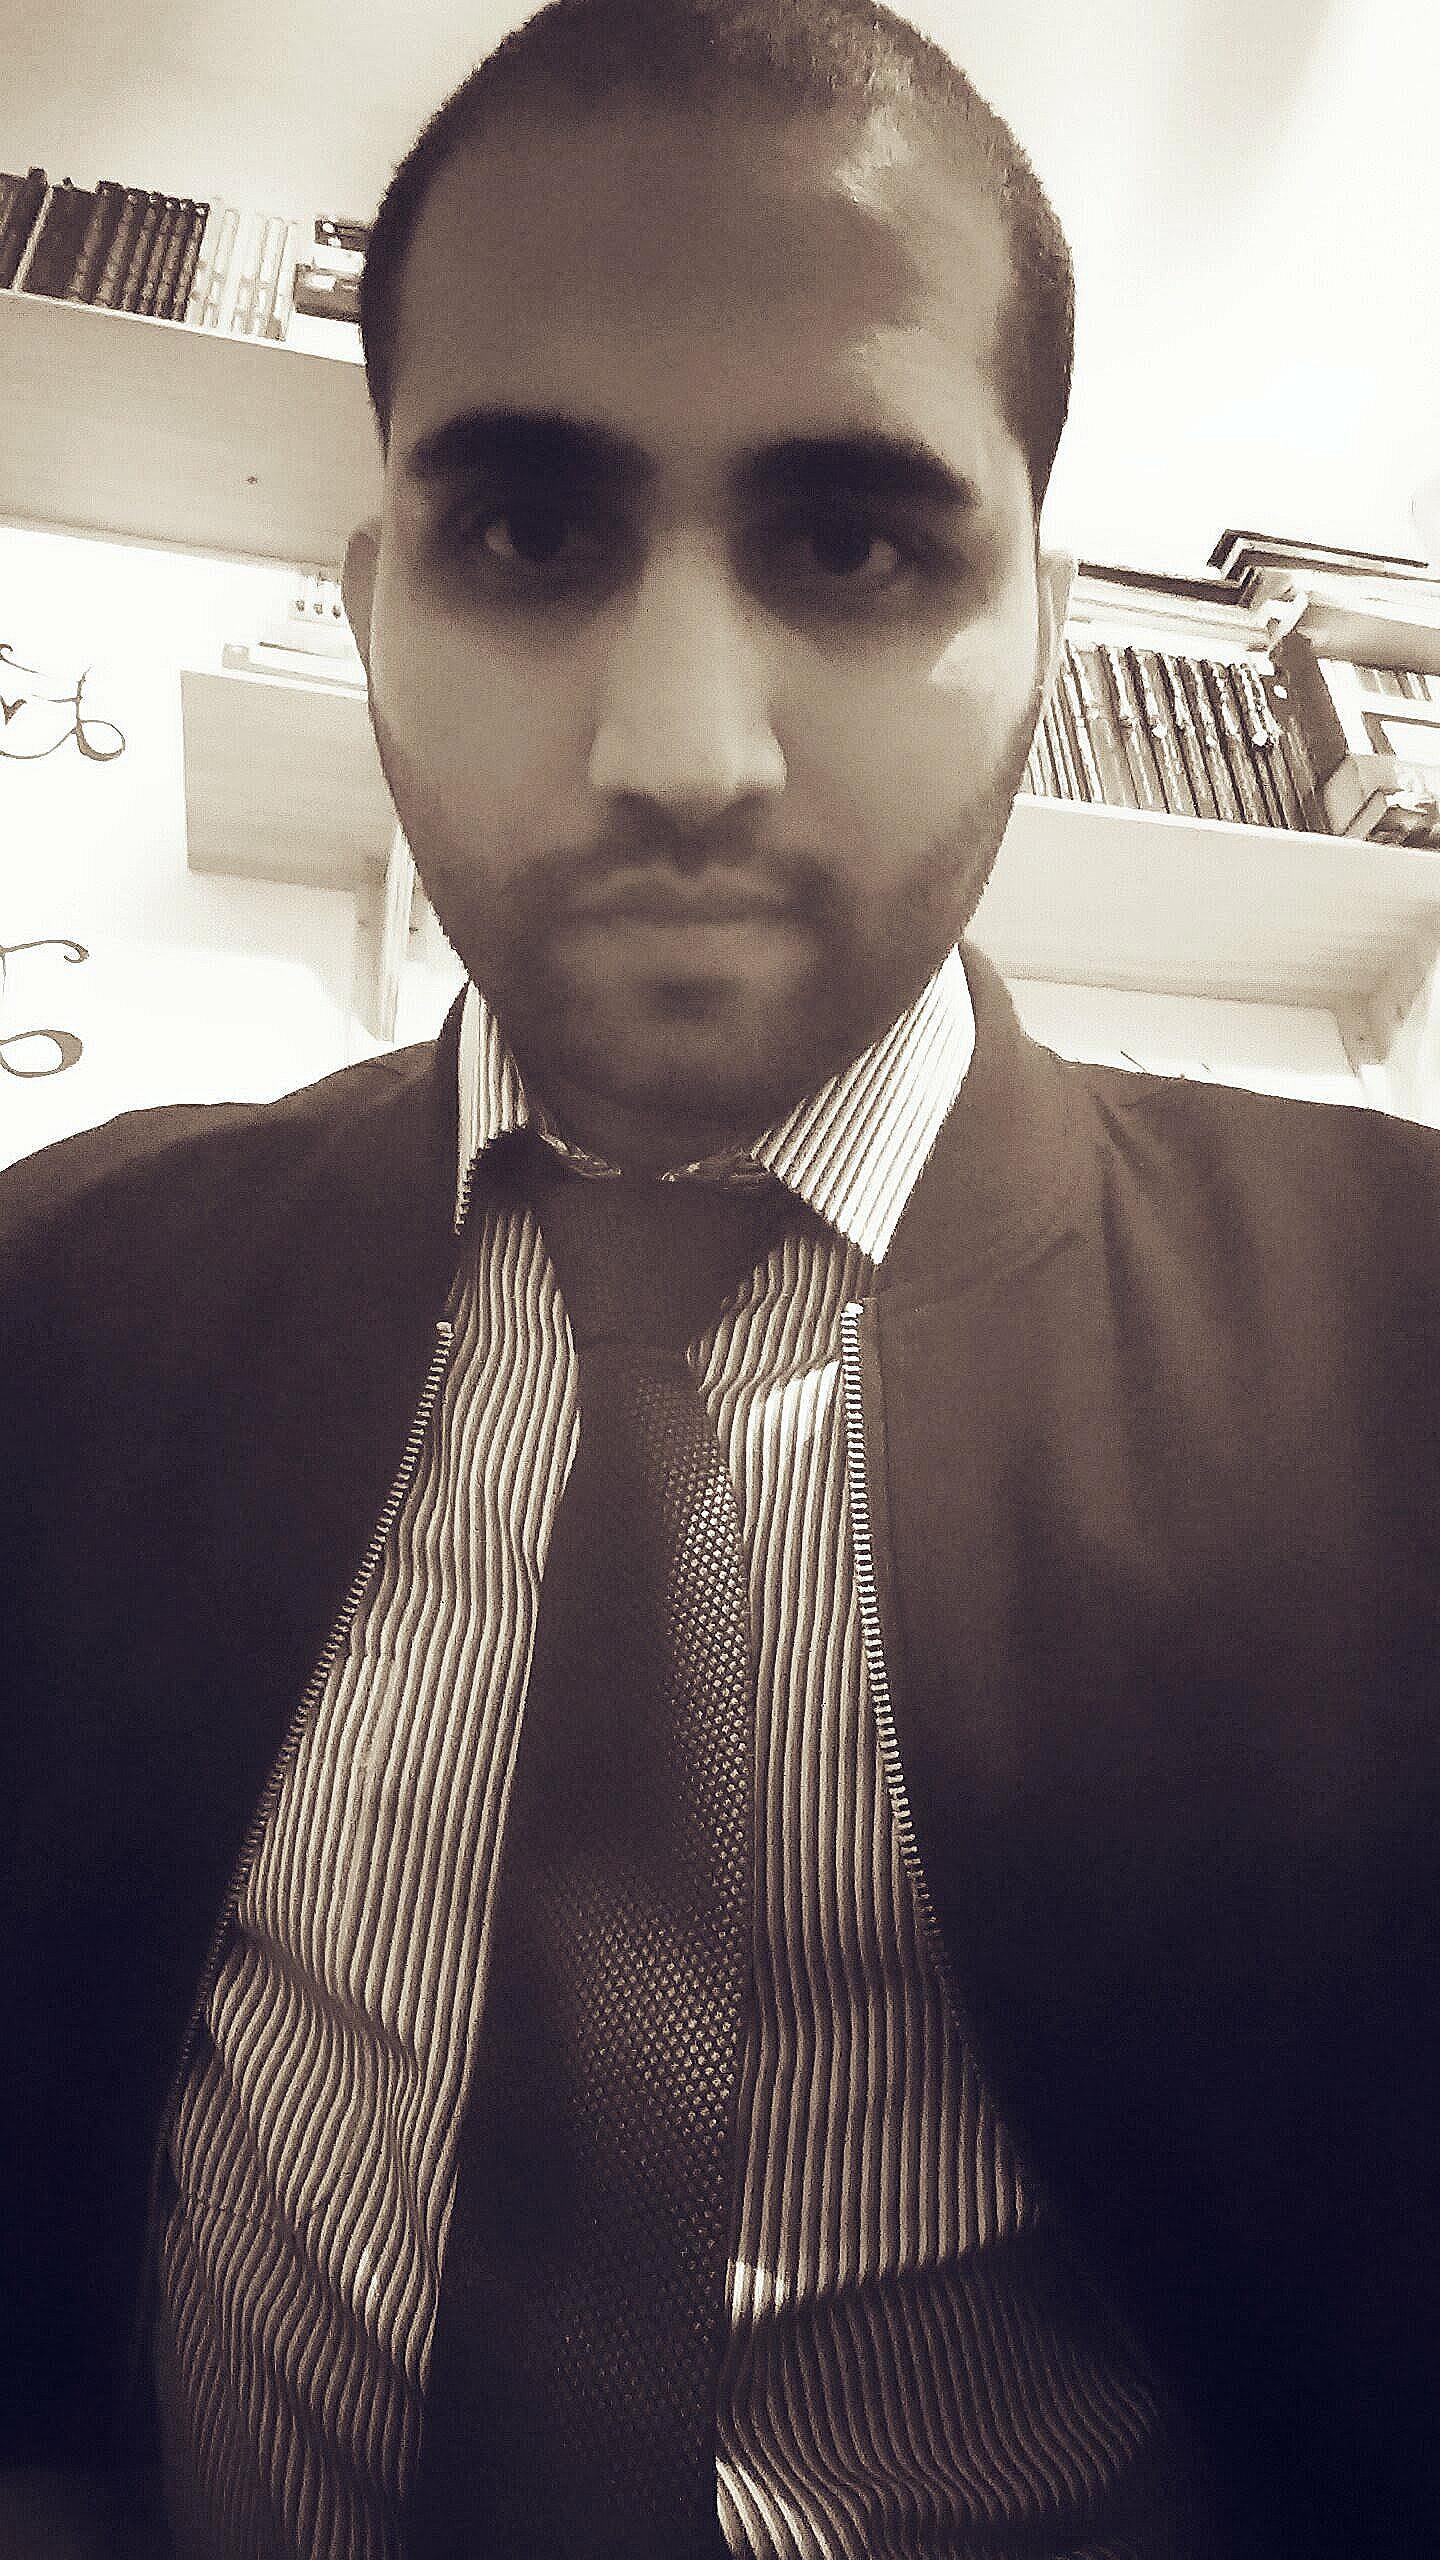 Mr. Muhammad Tutor